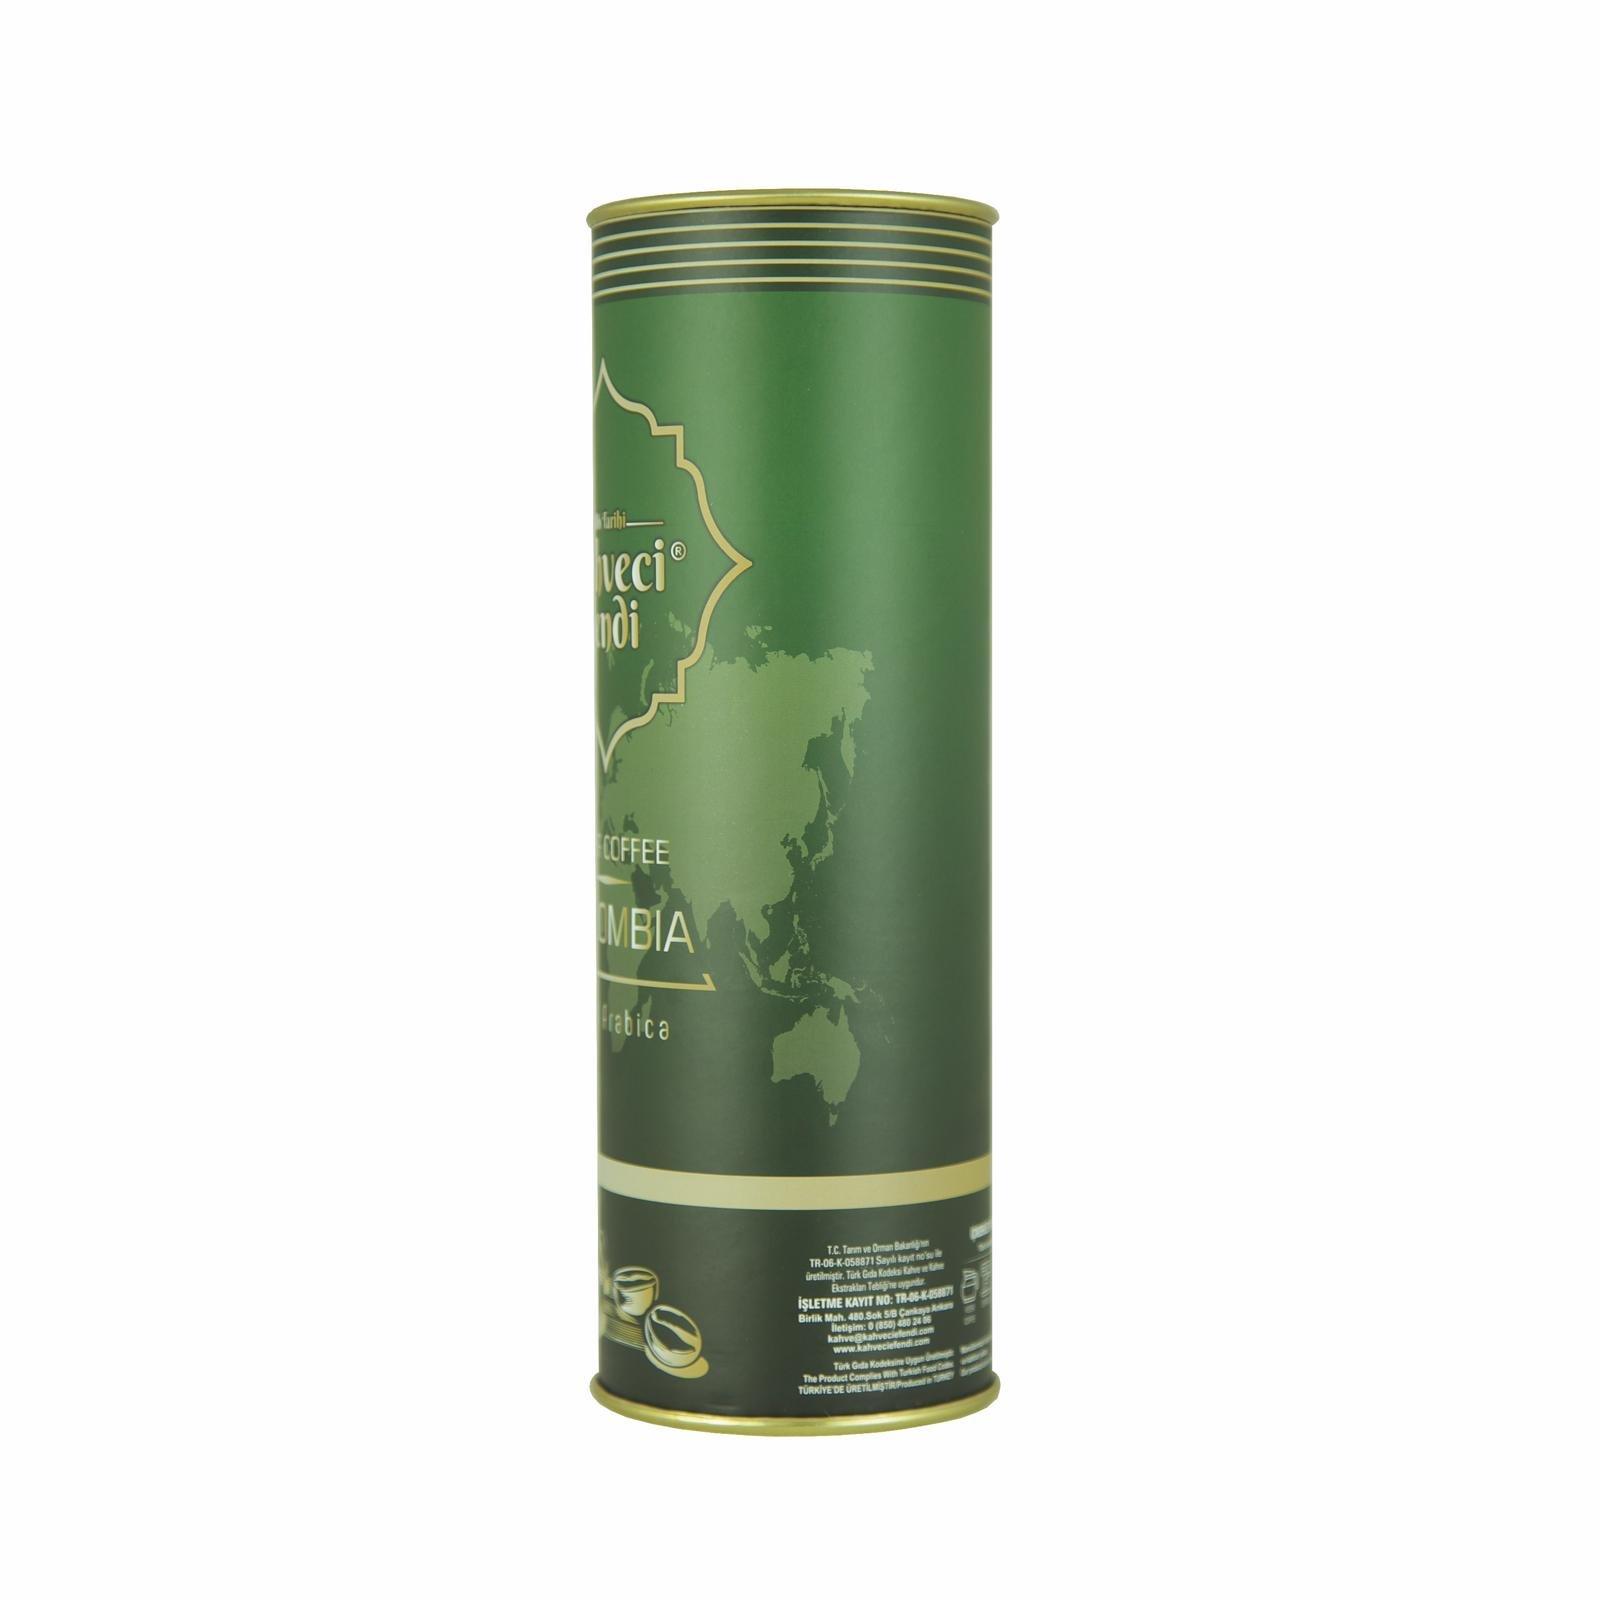 250 GR Colombia Filtre Kahve Premium Teneke Kutu